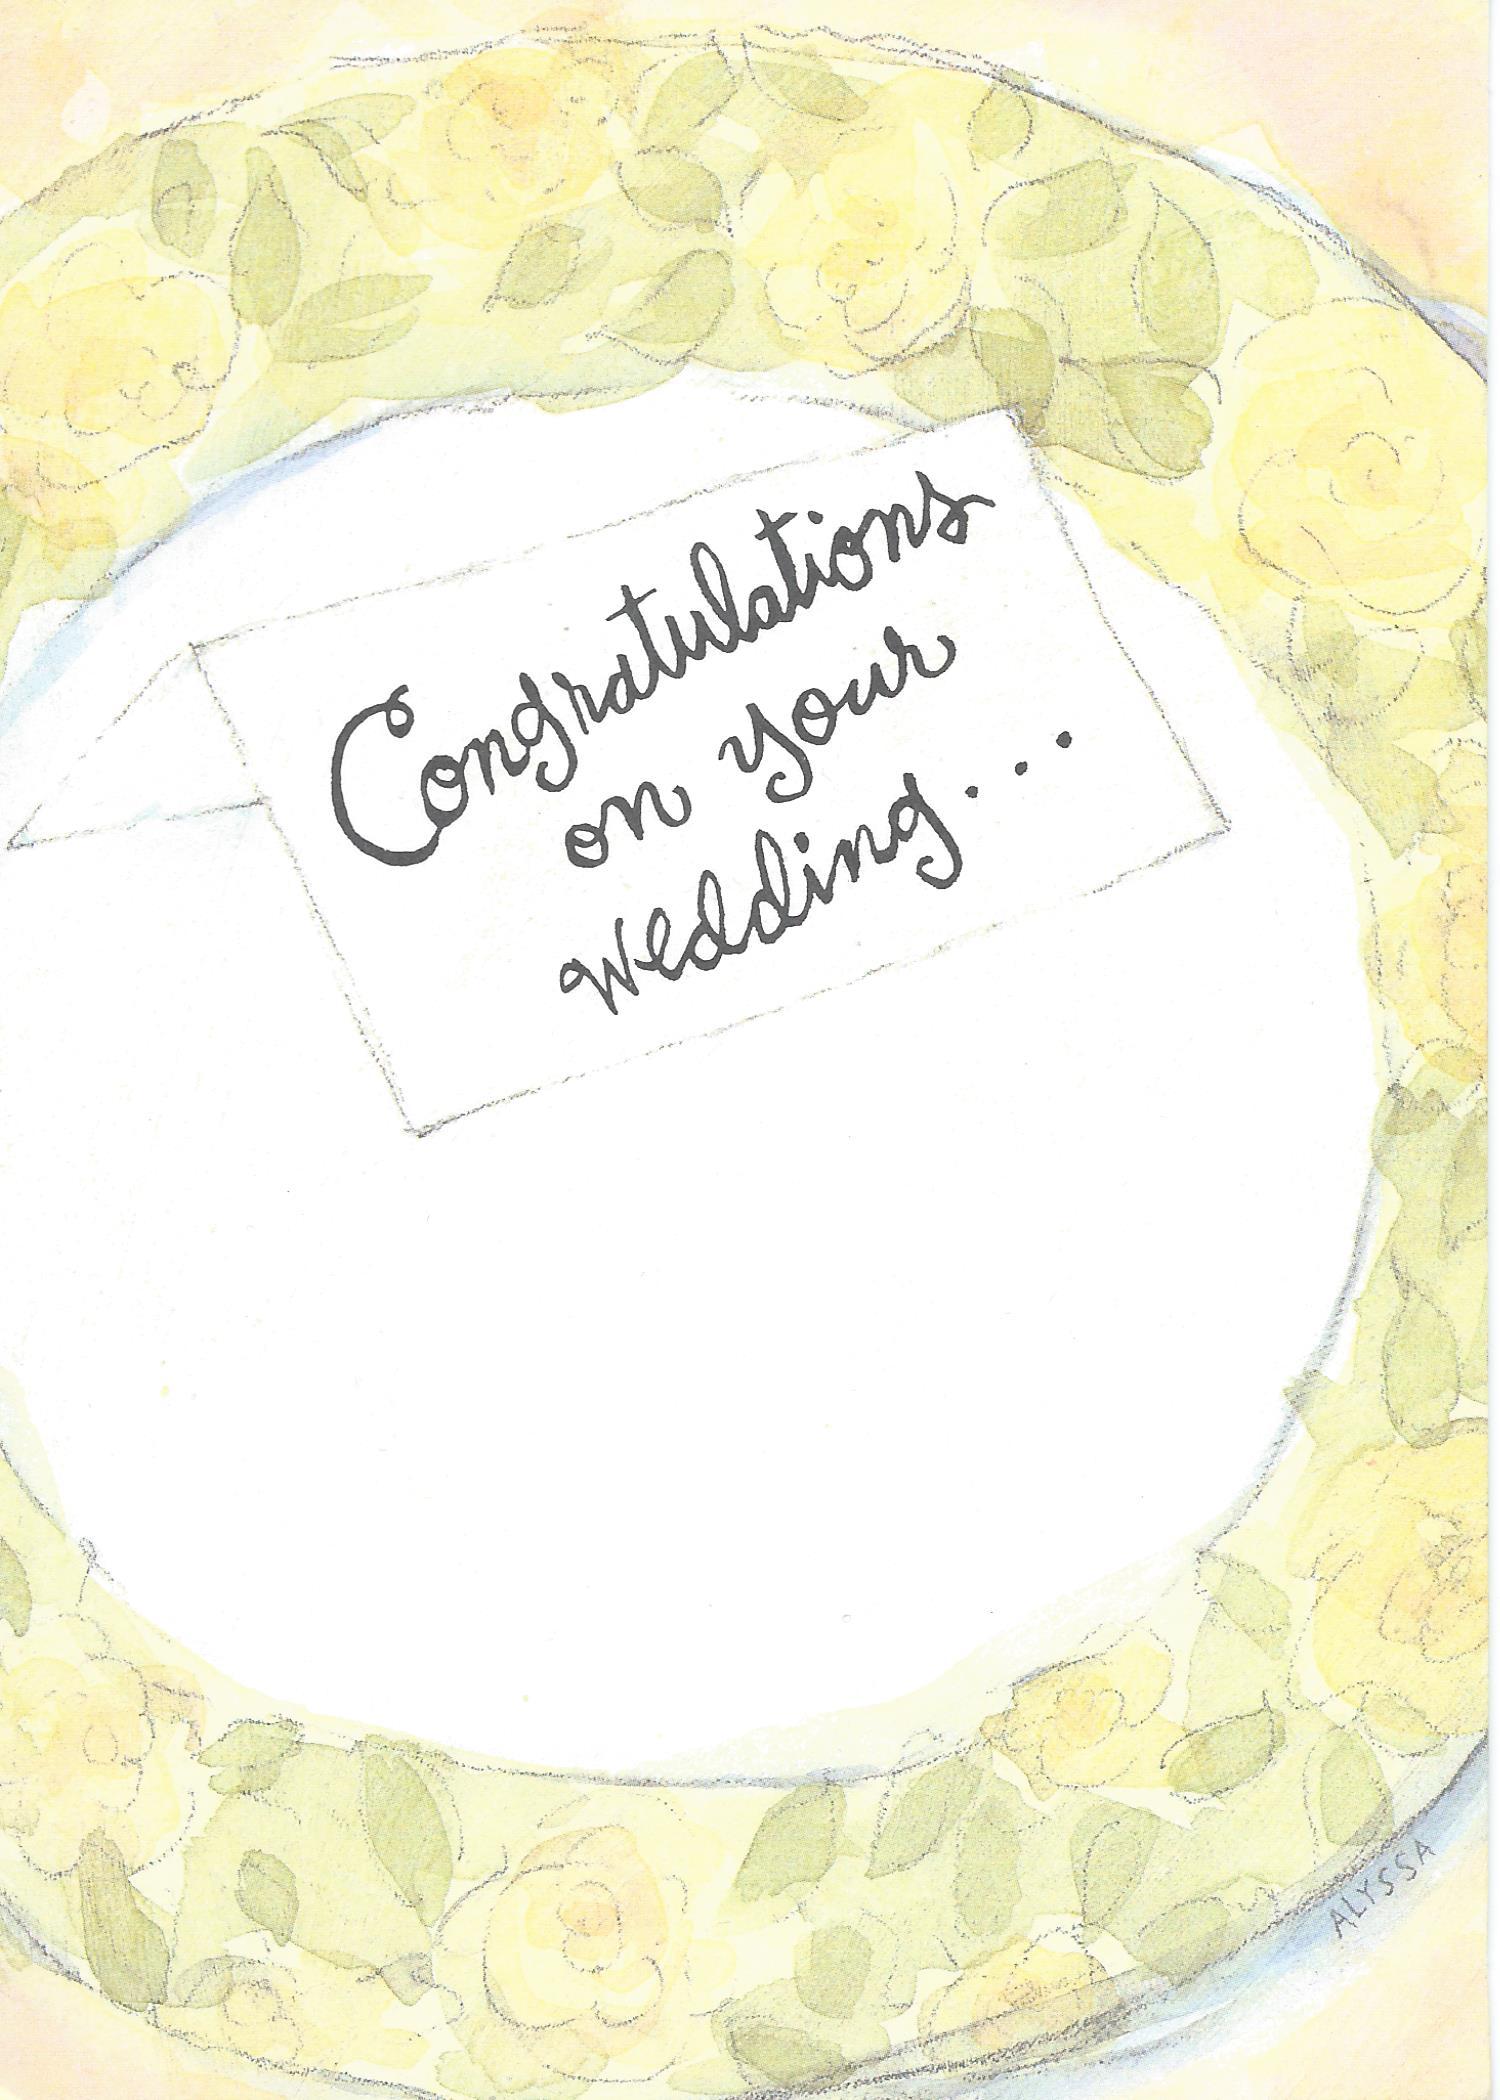 Congratulations on your wedding...